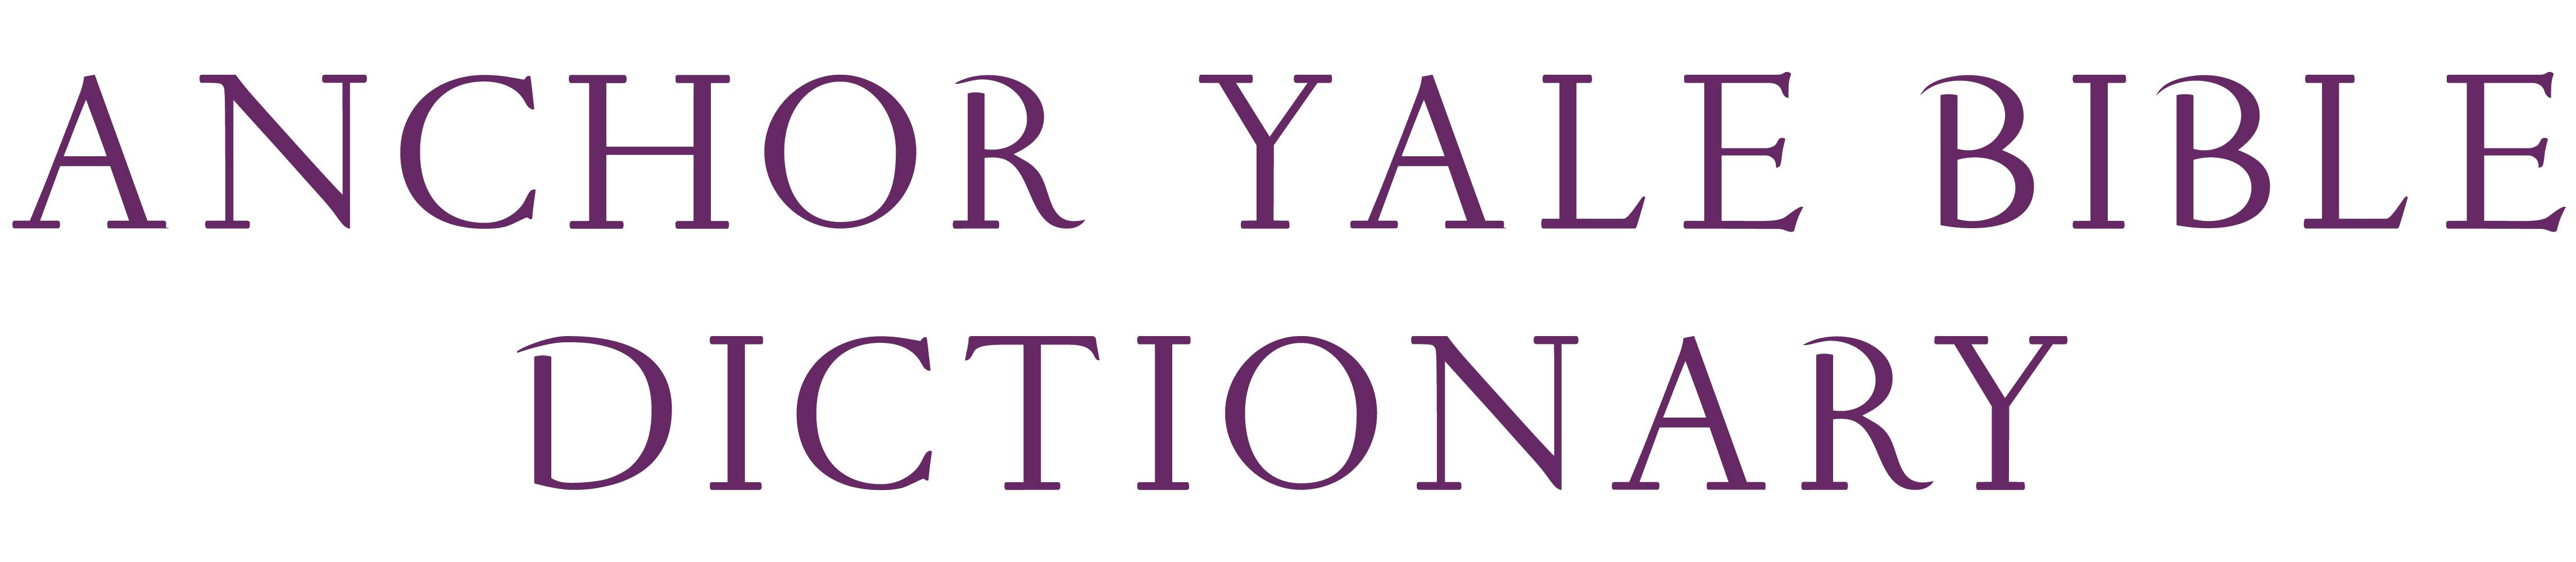 Anchor Yale Bile Dictionary logo